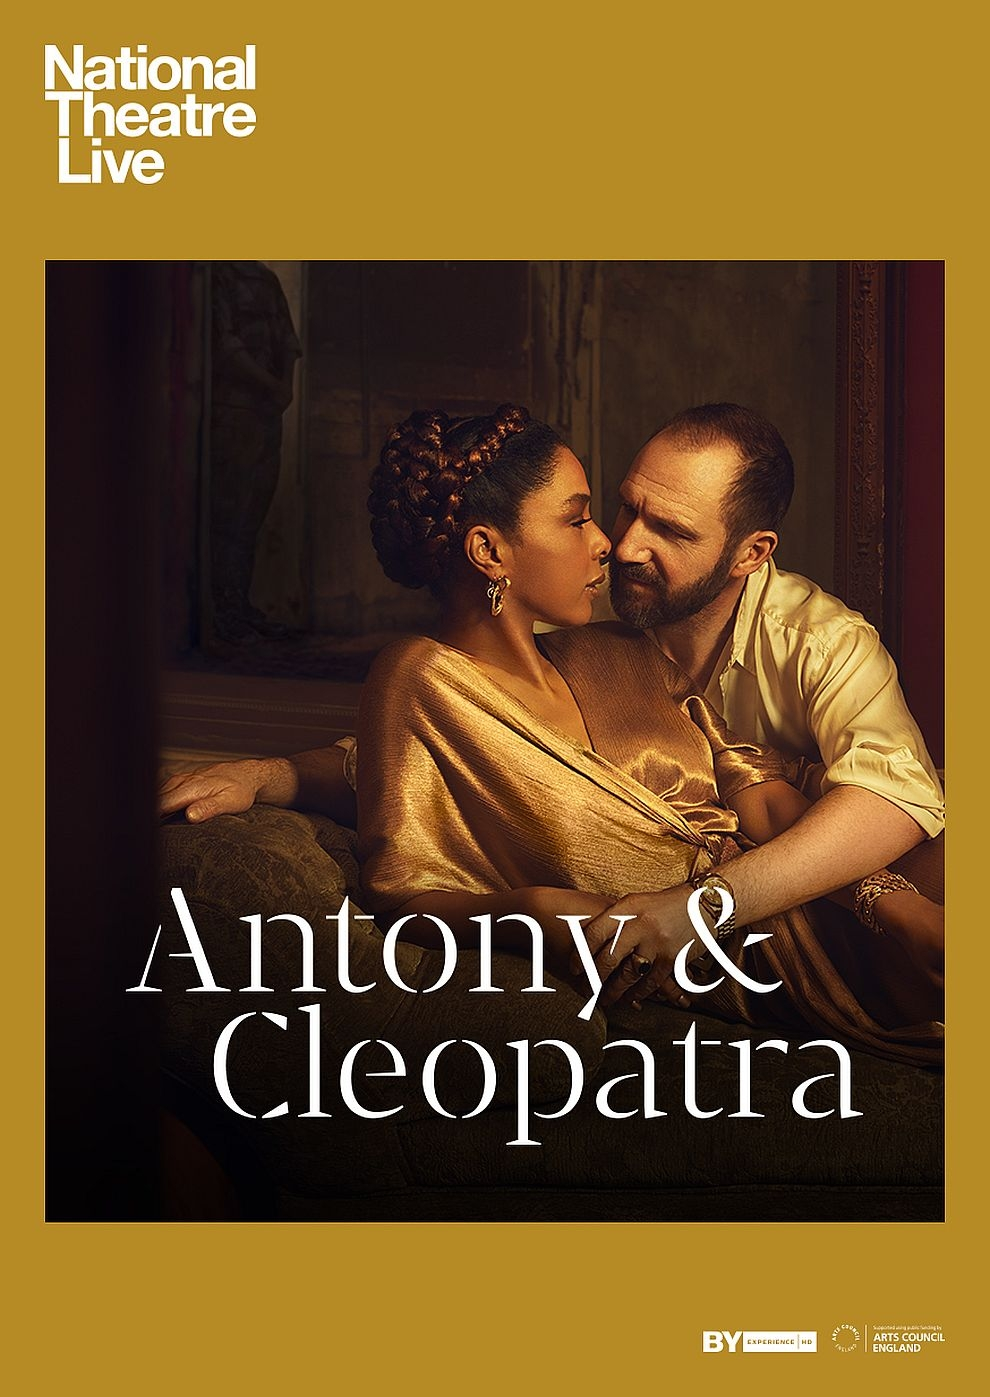 National Theatre Live: Antony & Cleopatra (Poster)